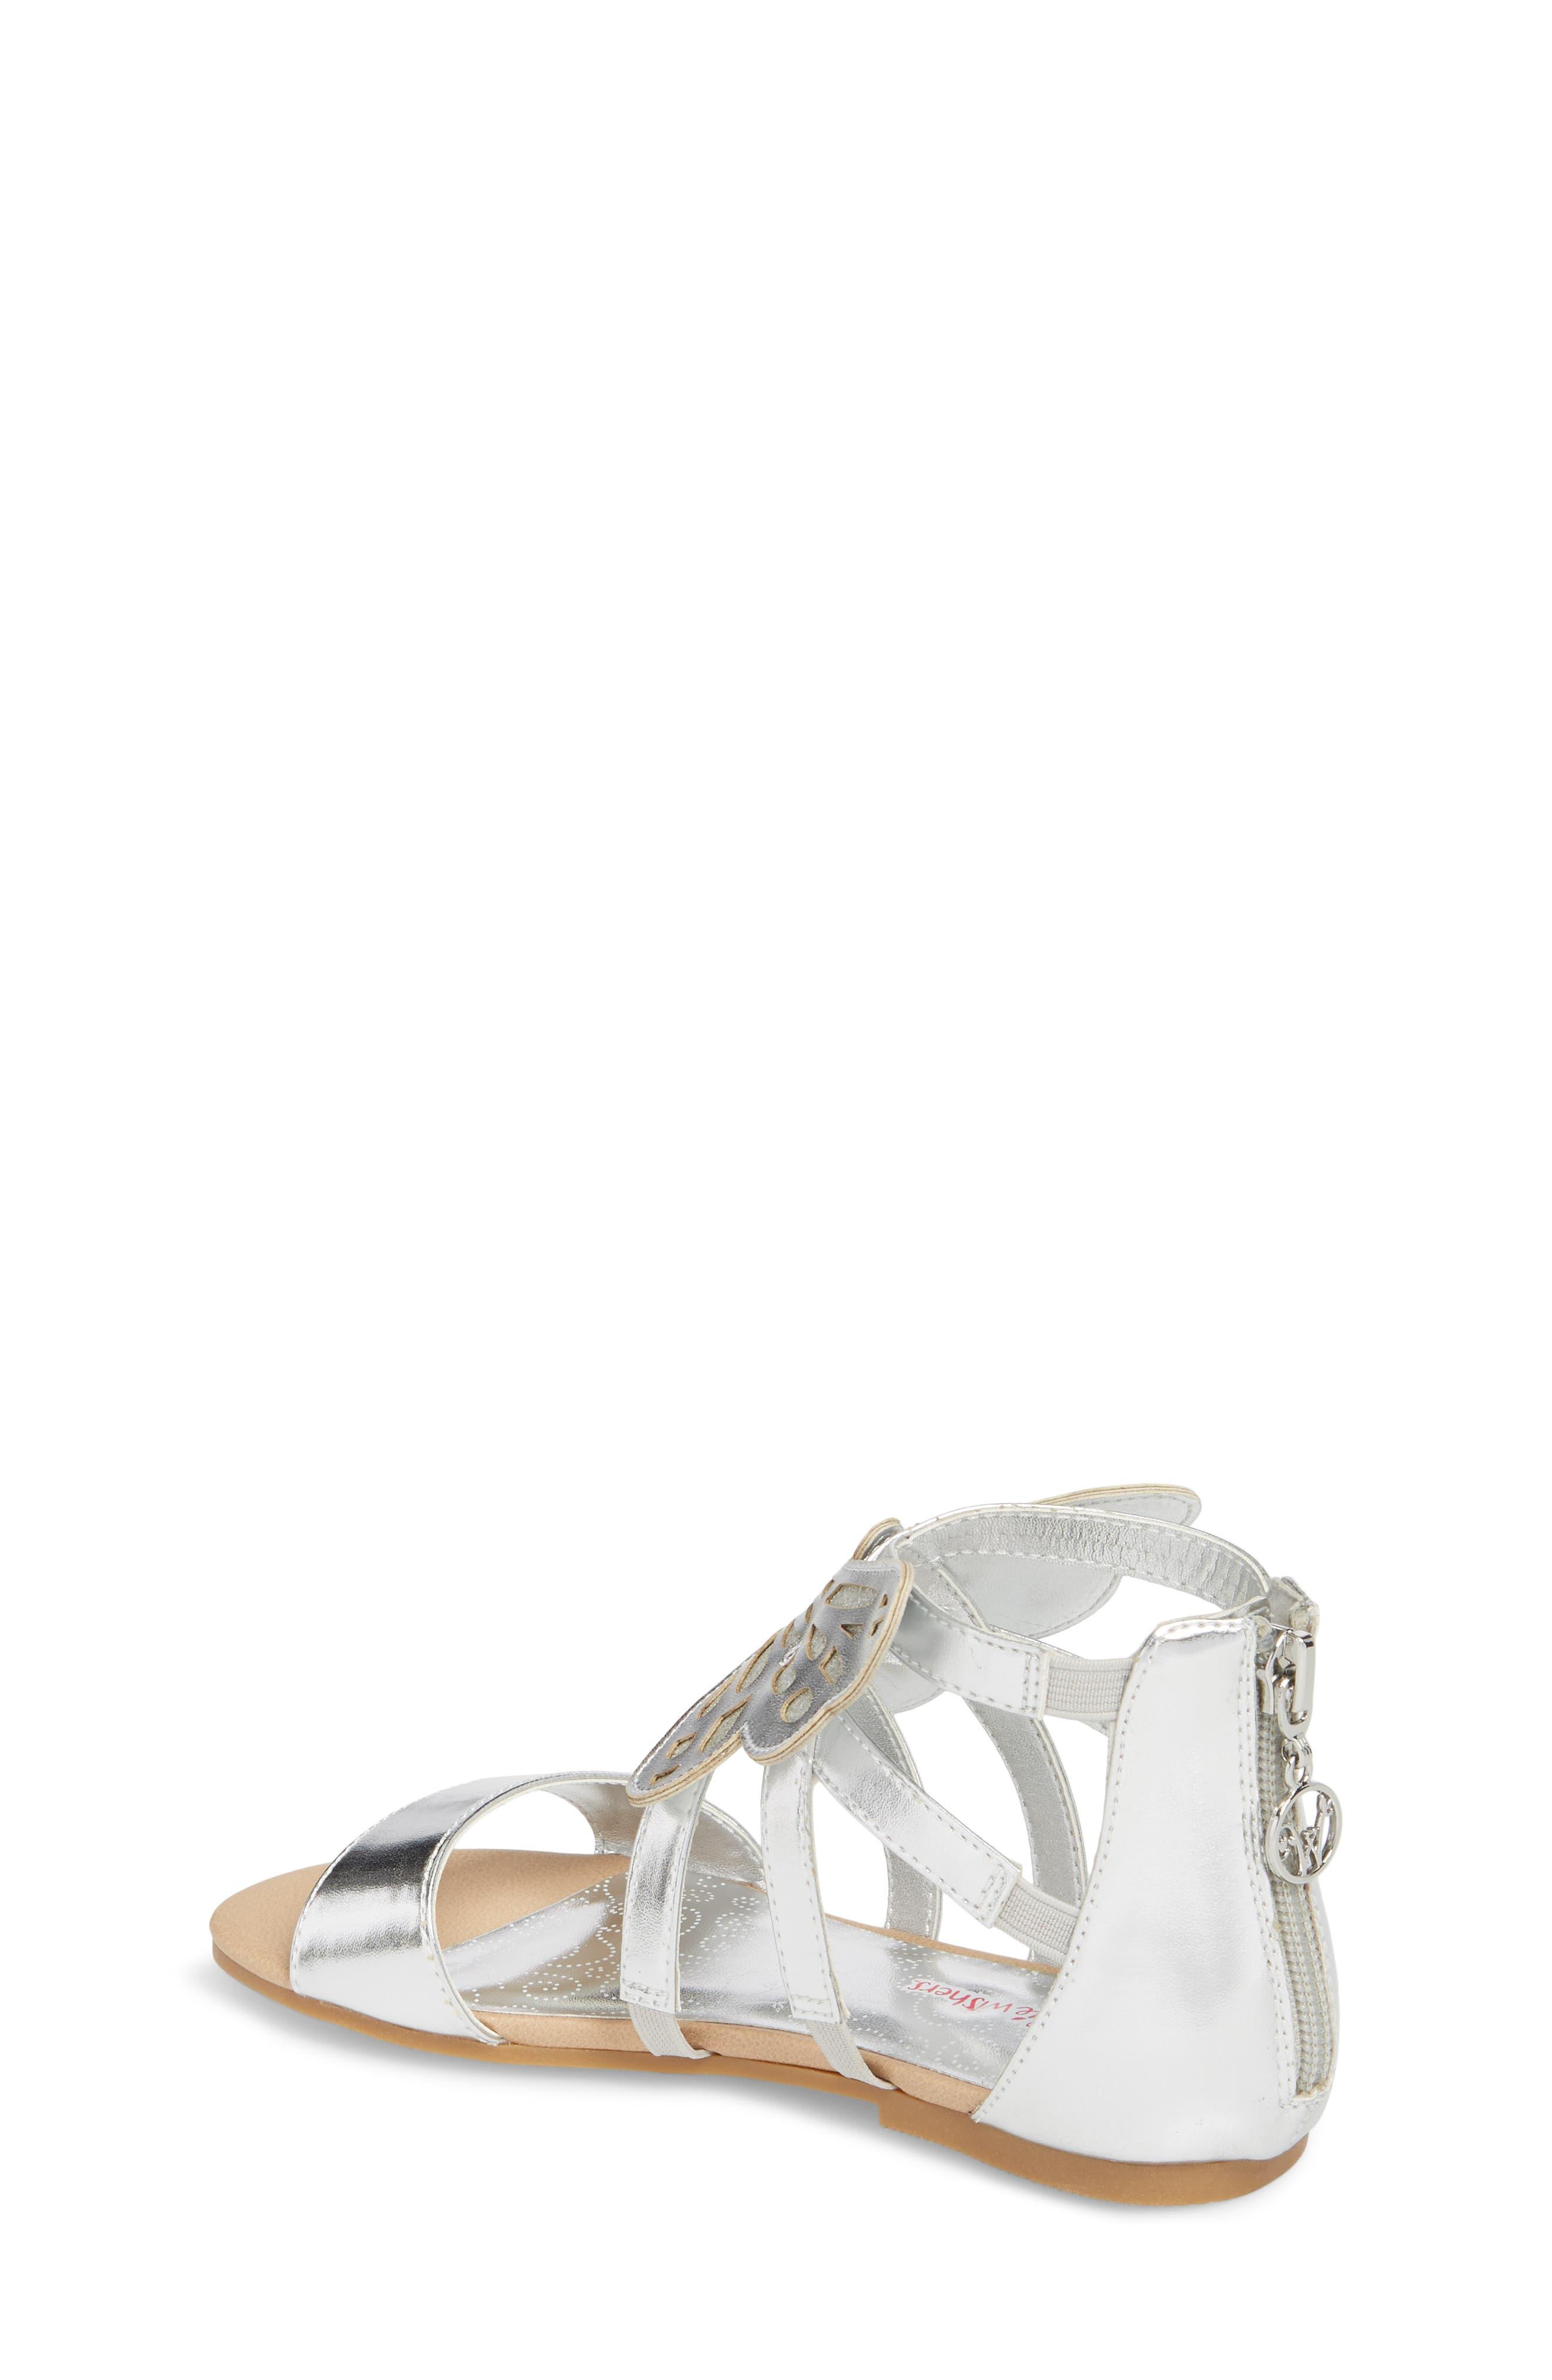 Willa Flutter Metallic Sandal,                             Alternate thumbnail 2, color,                             Silver Metallic